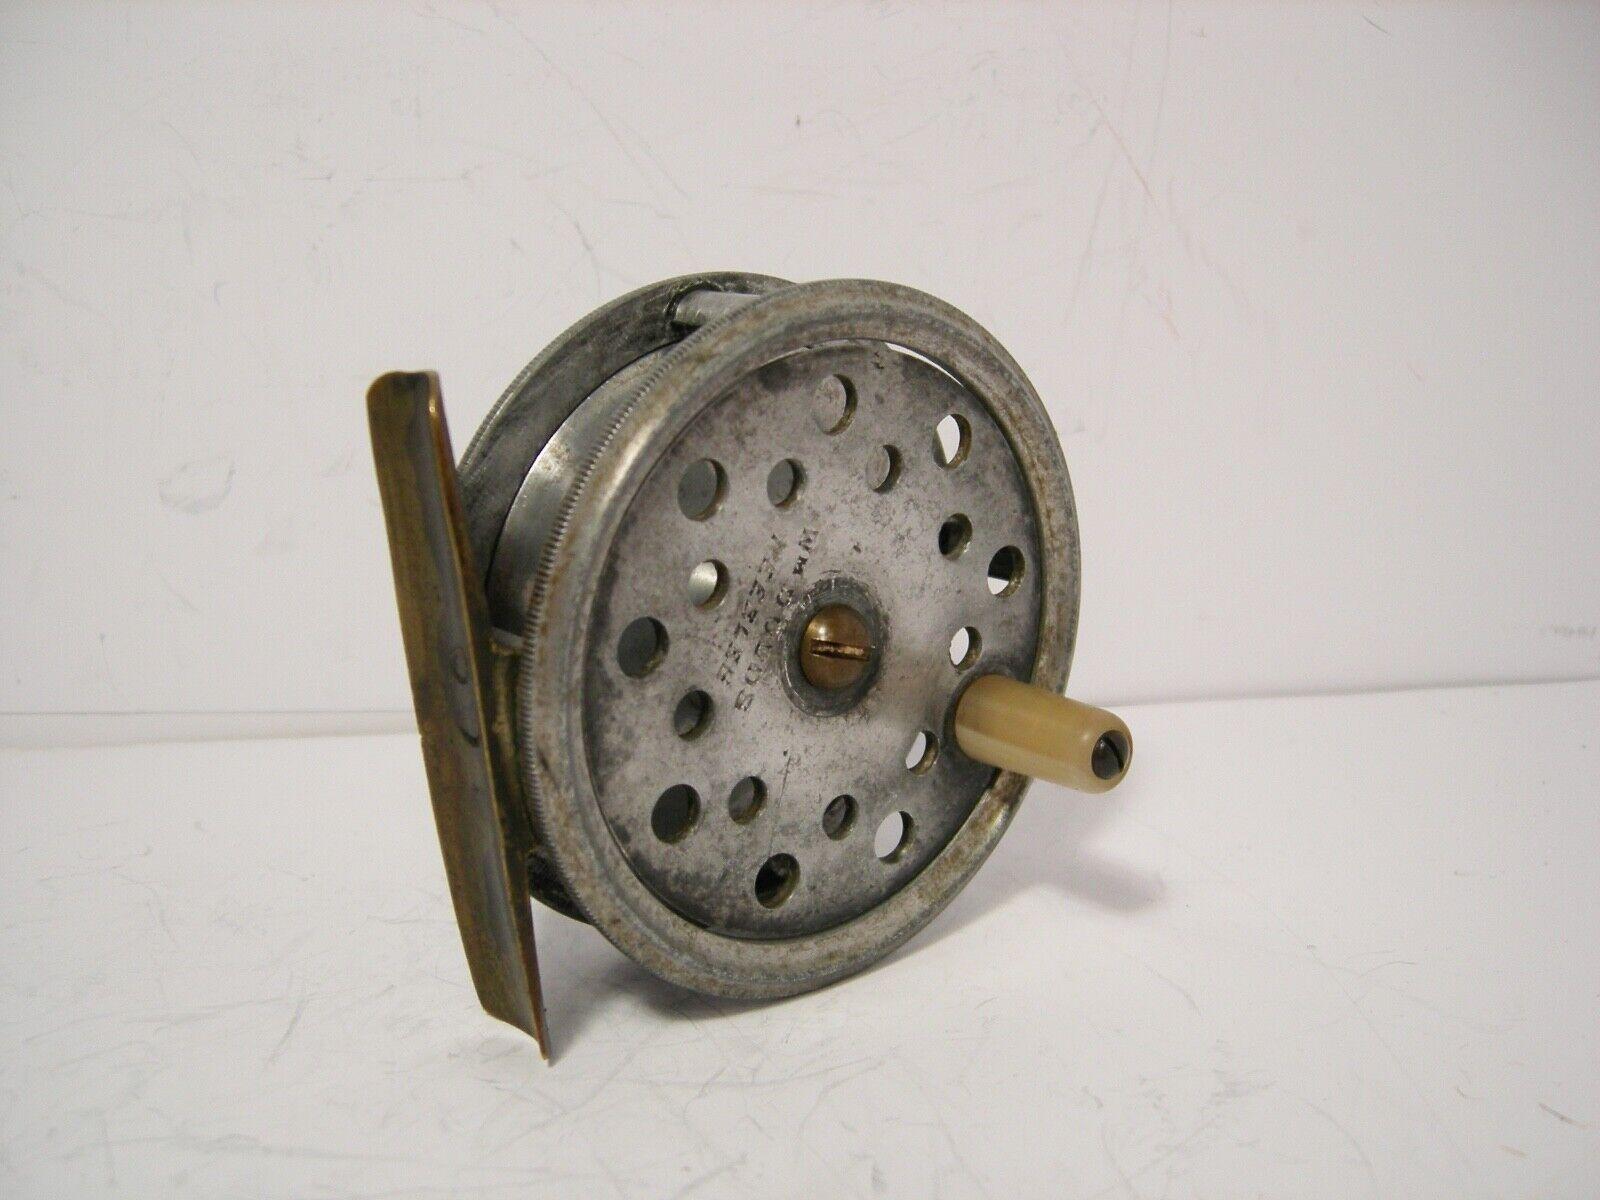 Vintage Antique Reuben Heaton 3  Alloy  Fly Fishing Reel  offering 100%